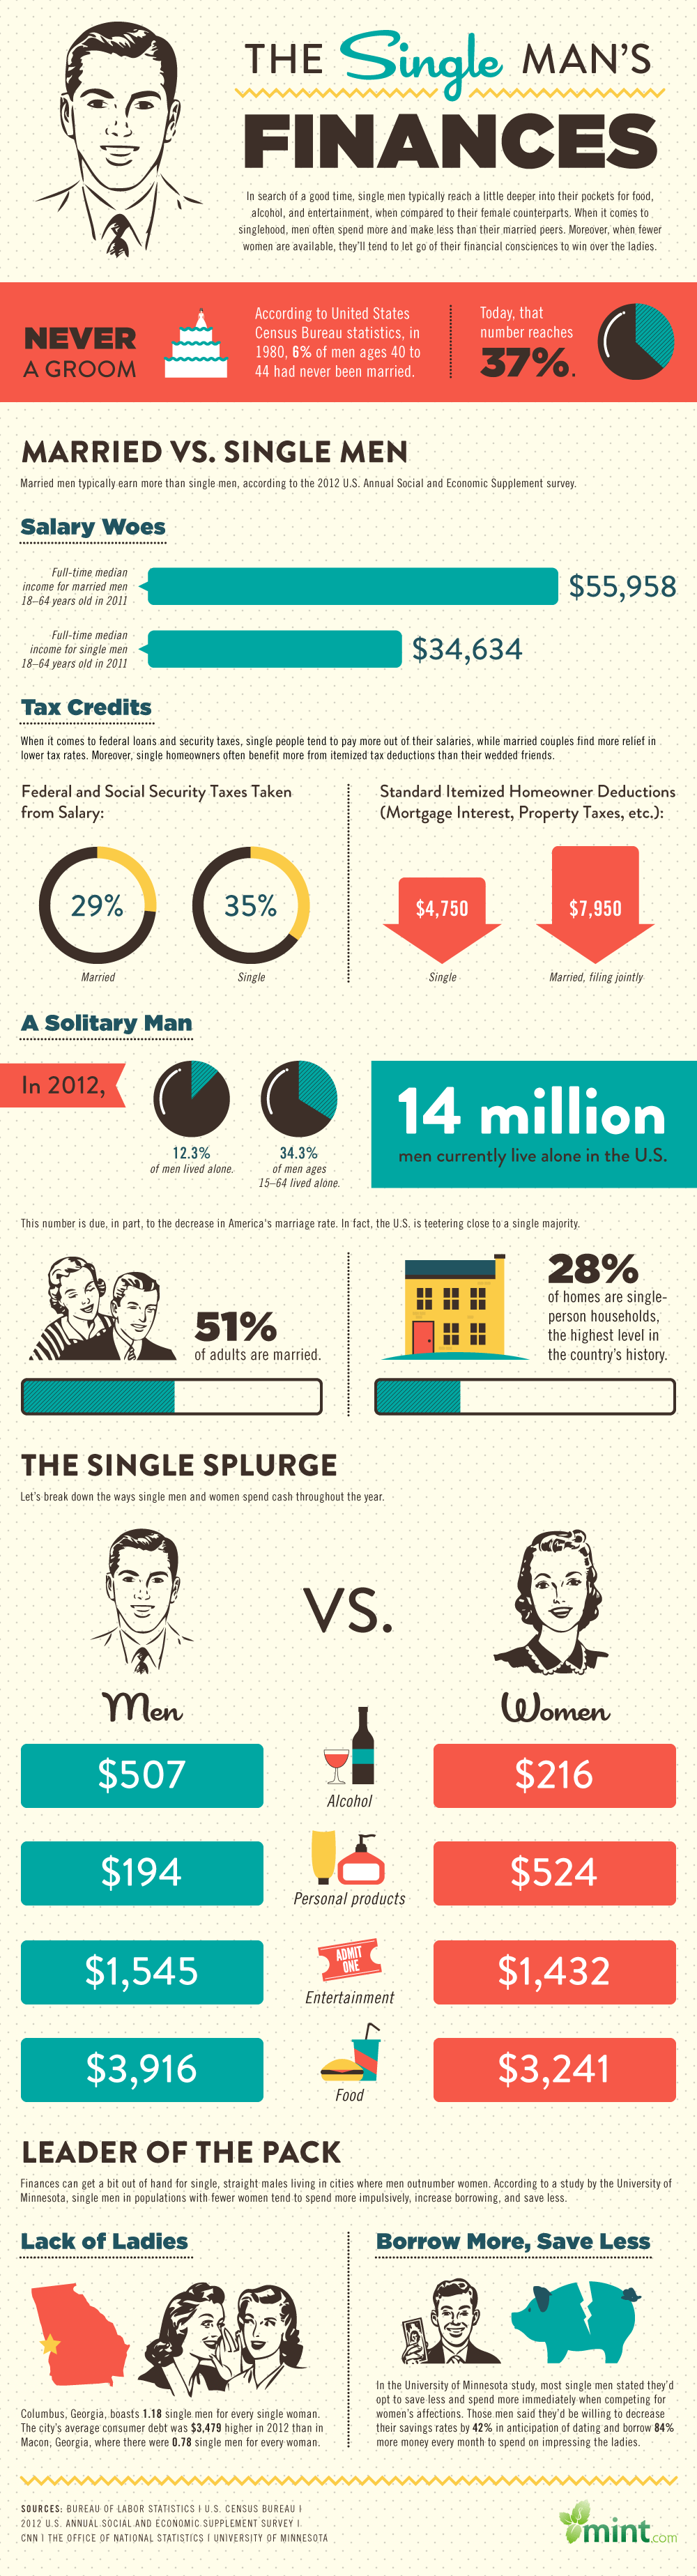 The Single Man's Finances